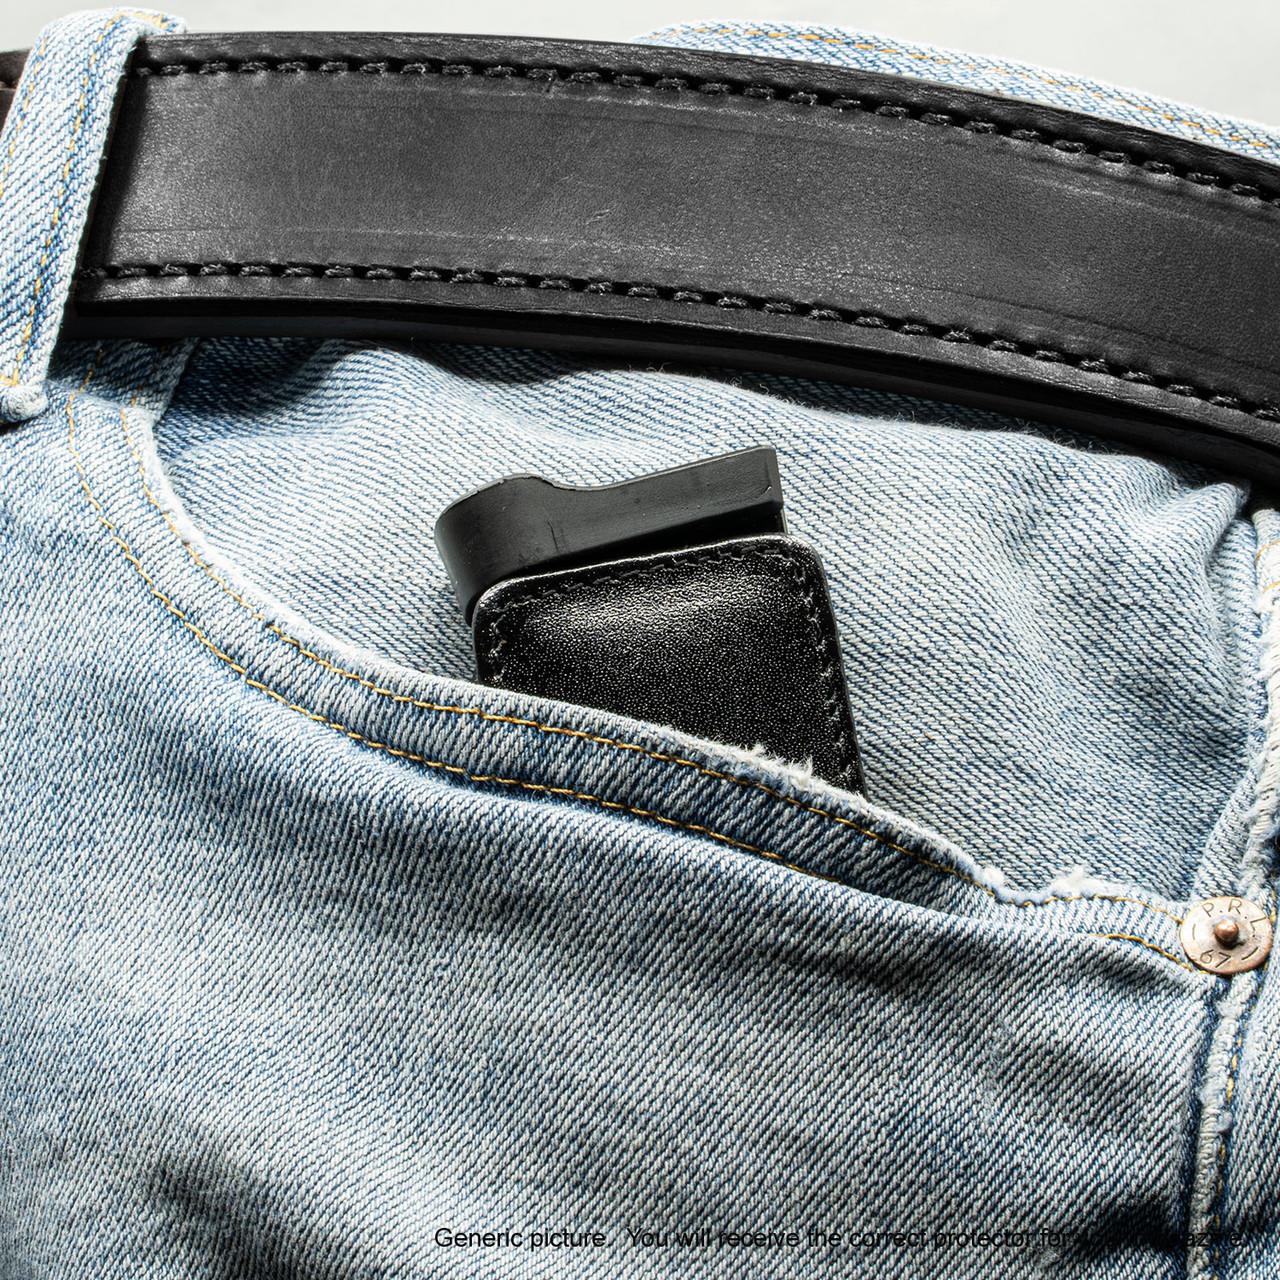 Bersa TPR9c Black Leather Magazine Pocket Protector